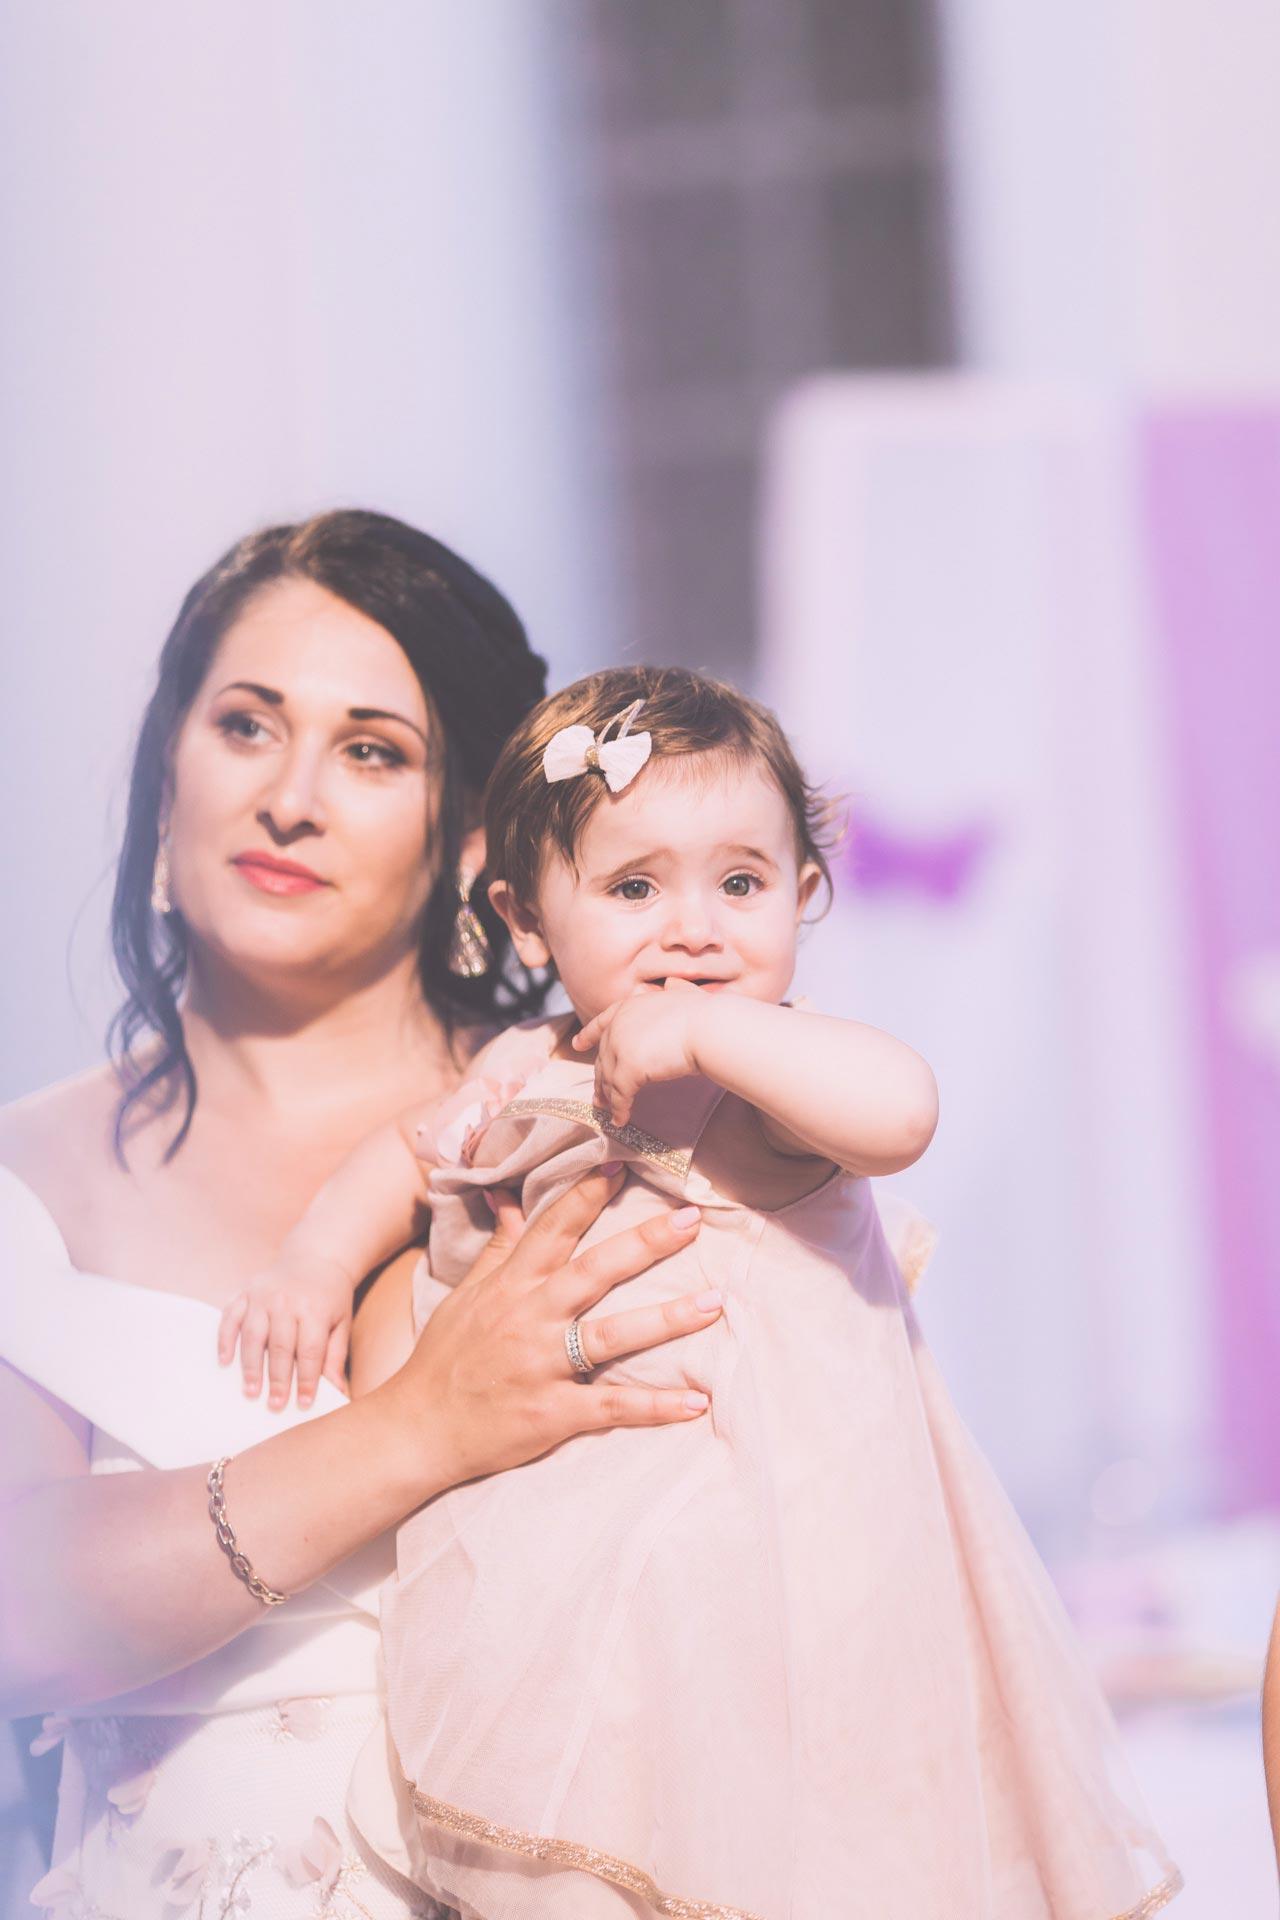 242 PhotoVaptisis Spetses vaptisi βαπτιση μωρο βαπτιστικά βαπριση σπετσες αγιος μαμας διακοσμηση βάπτισης γονείς νονά